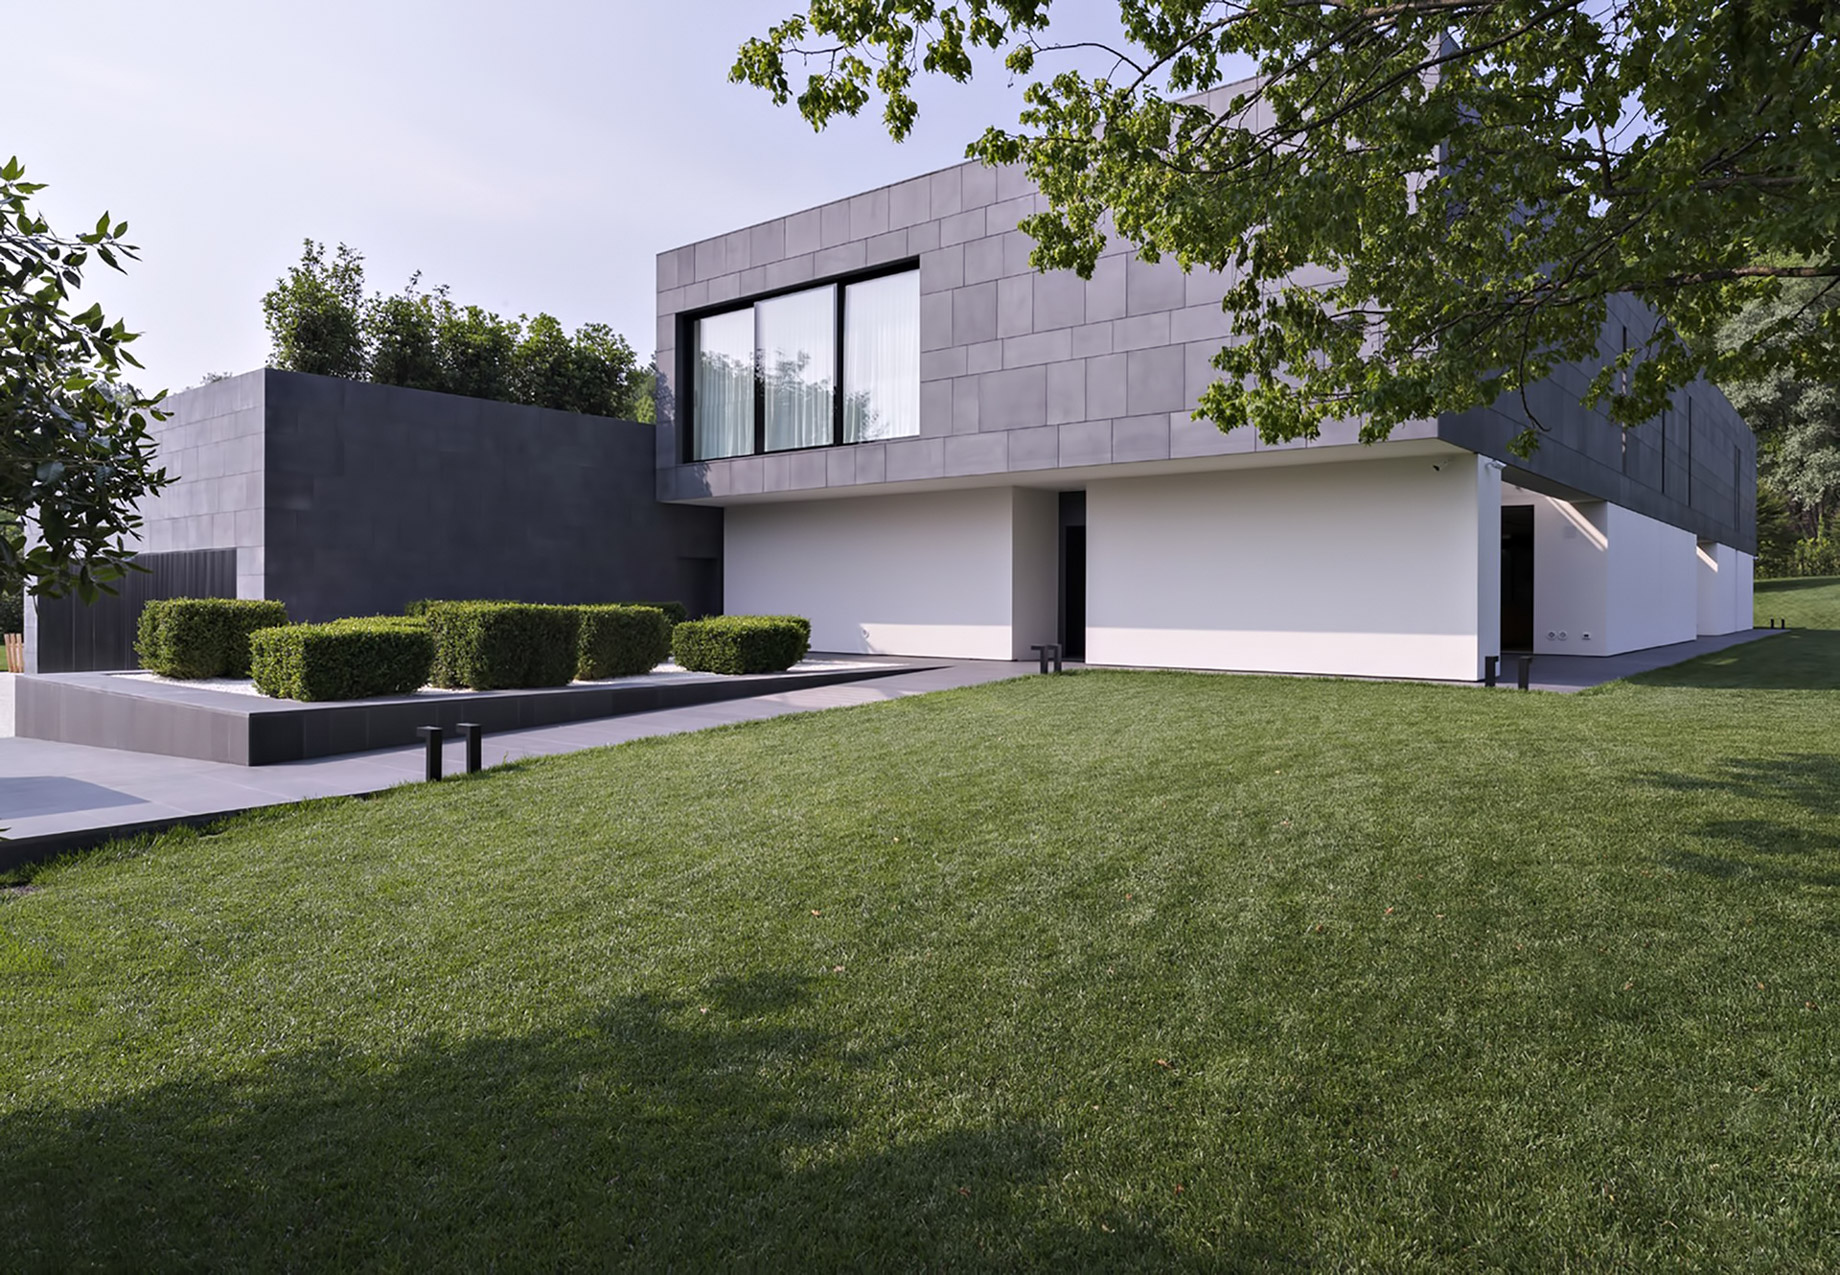 Pietra Luxury Villa – Conegliano, Treviso, Veneto, Italy